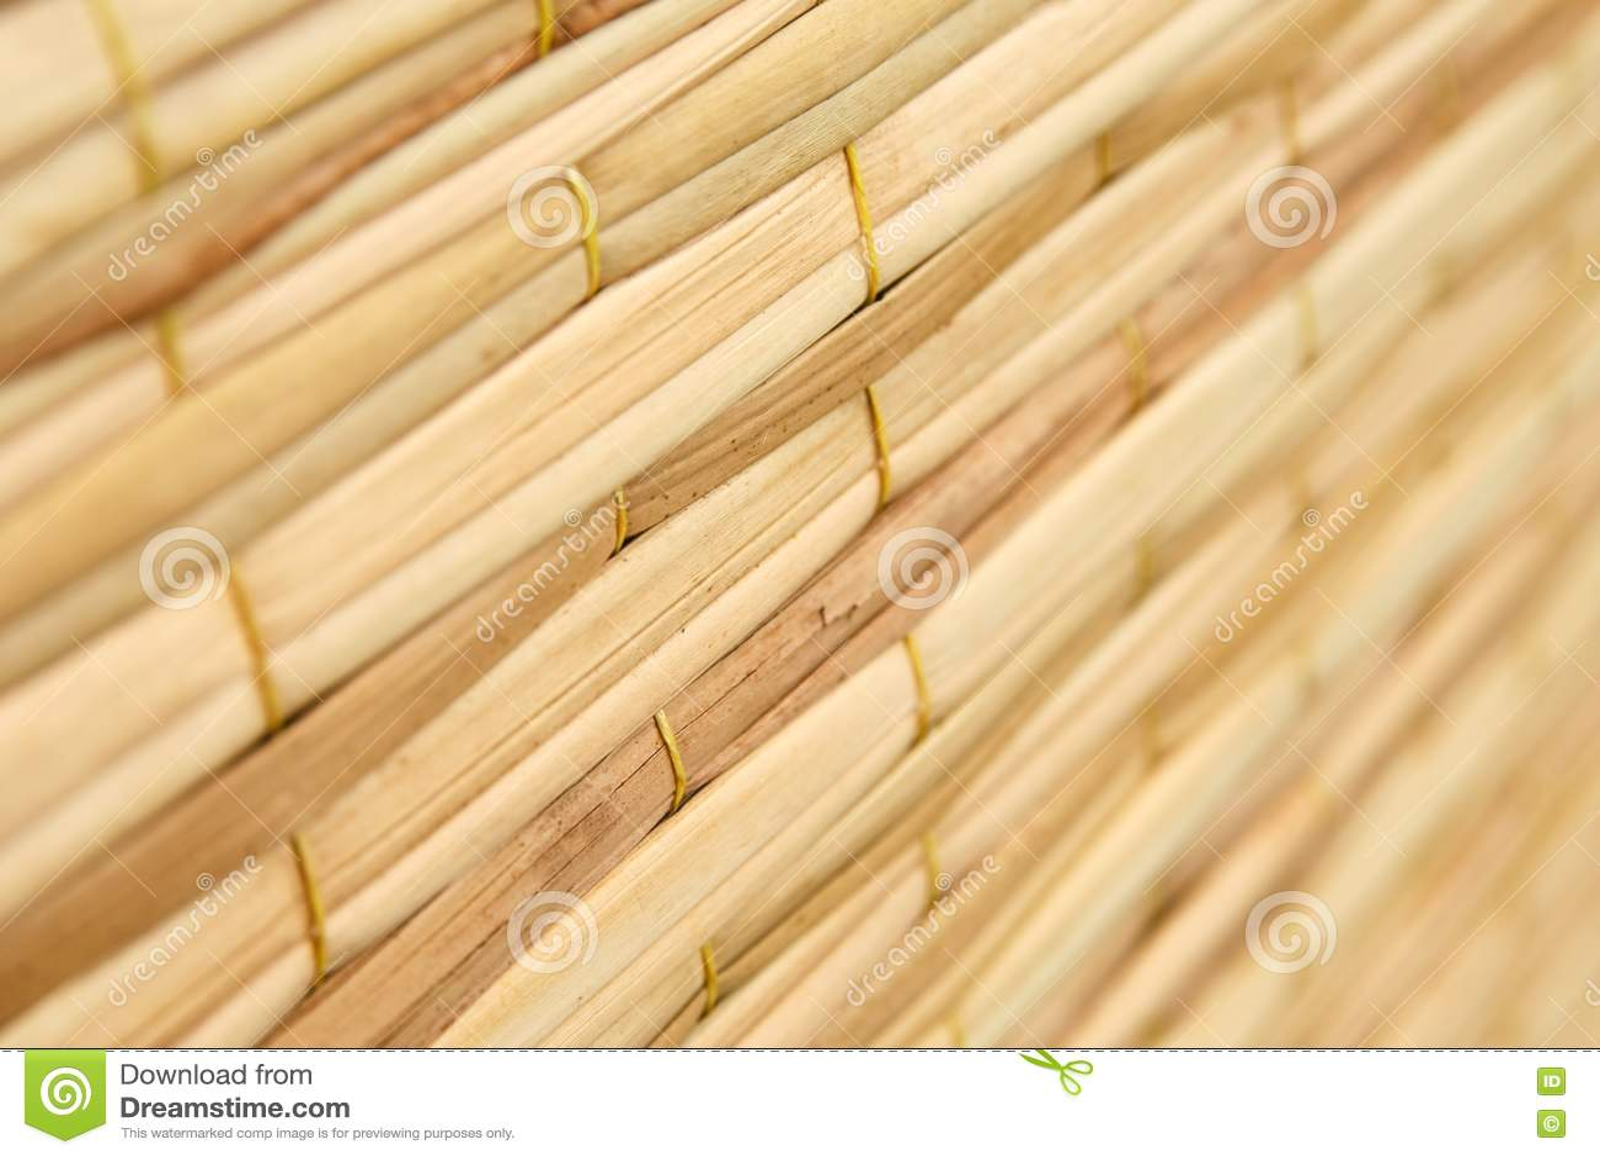 weave reed pattern - photo #8